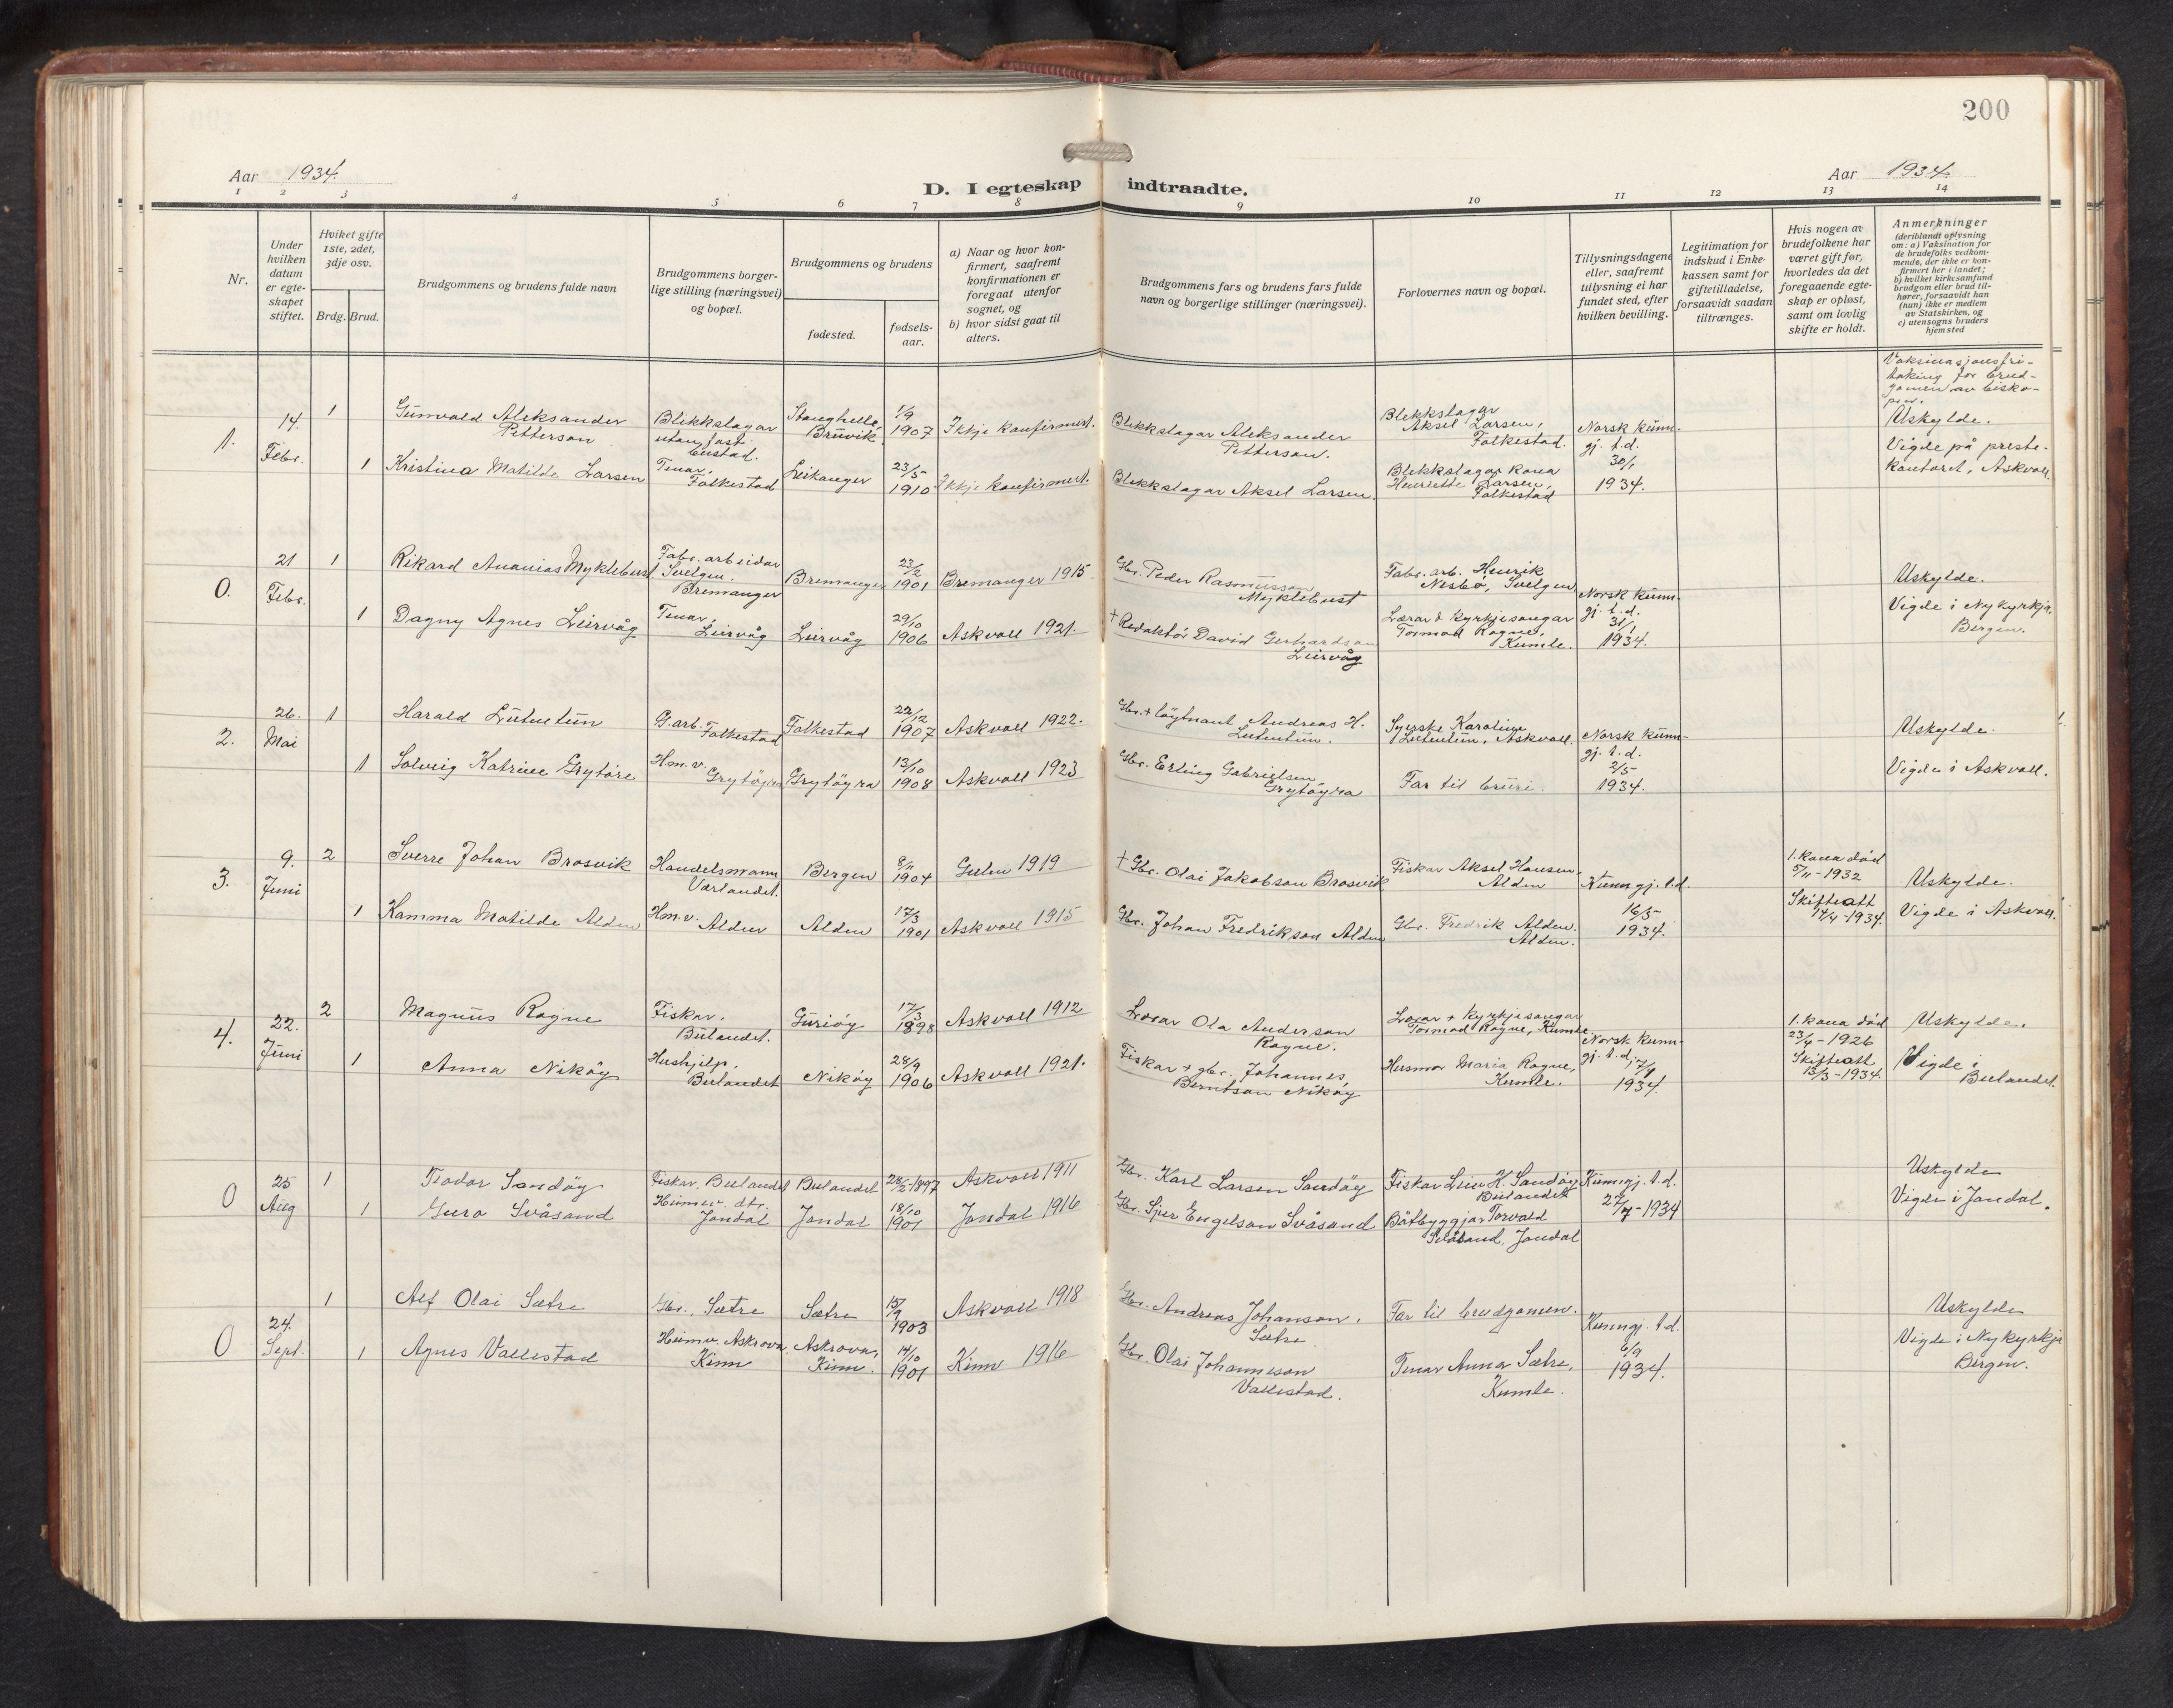 SAB, Askvoll sokneprestembete, H/Hab/Habb/L0002: Klokkerbok nr. B 2, 1910-1947, s. 199b-200a